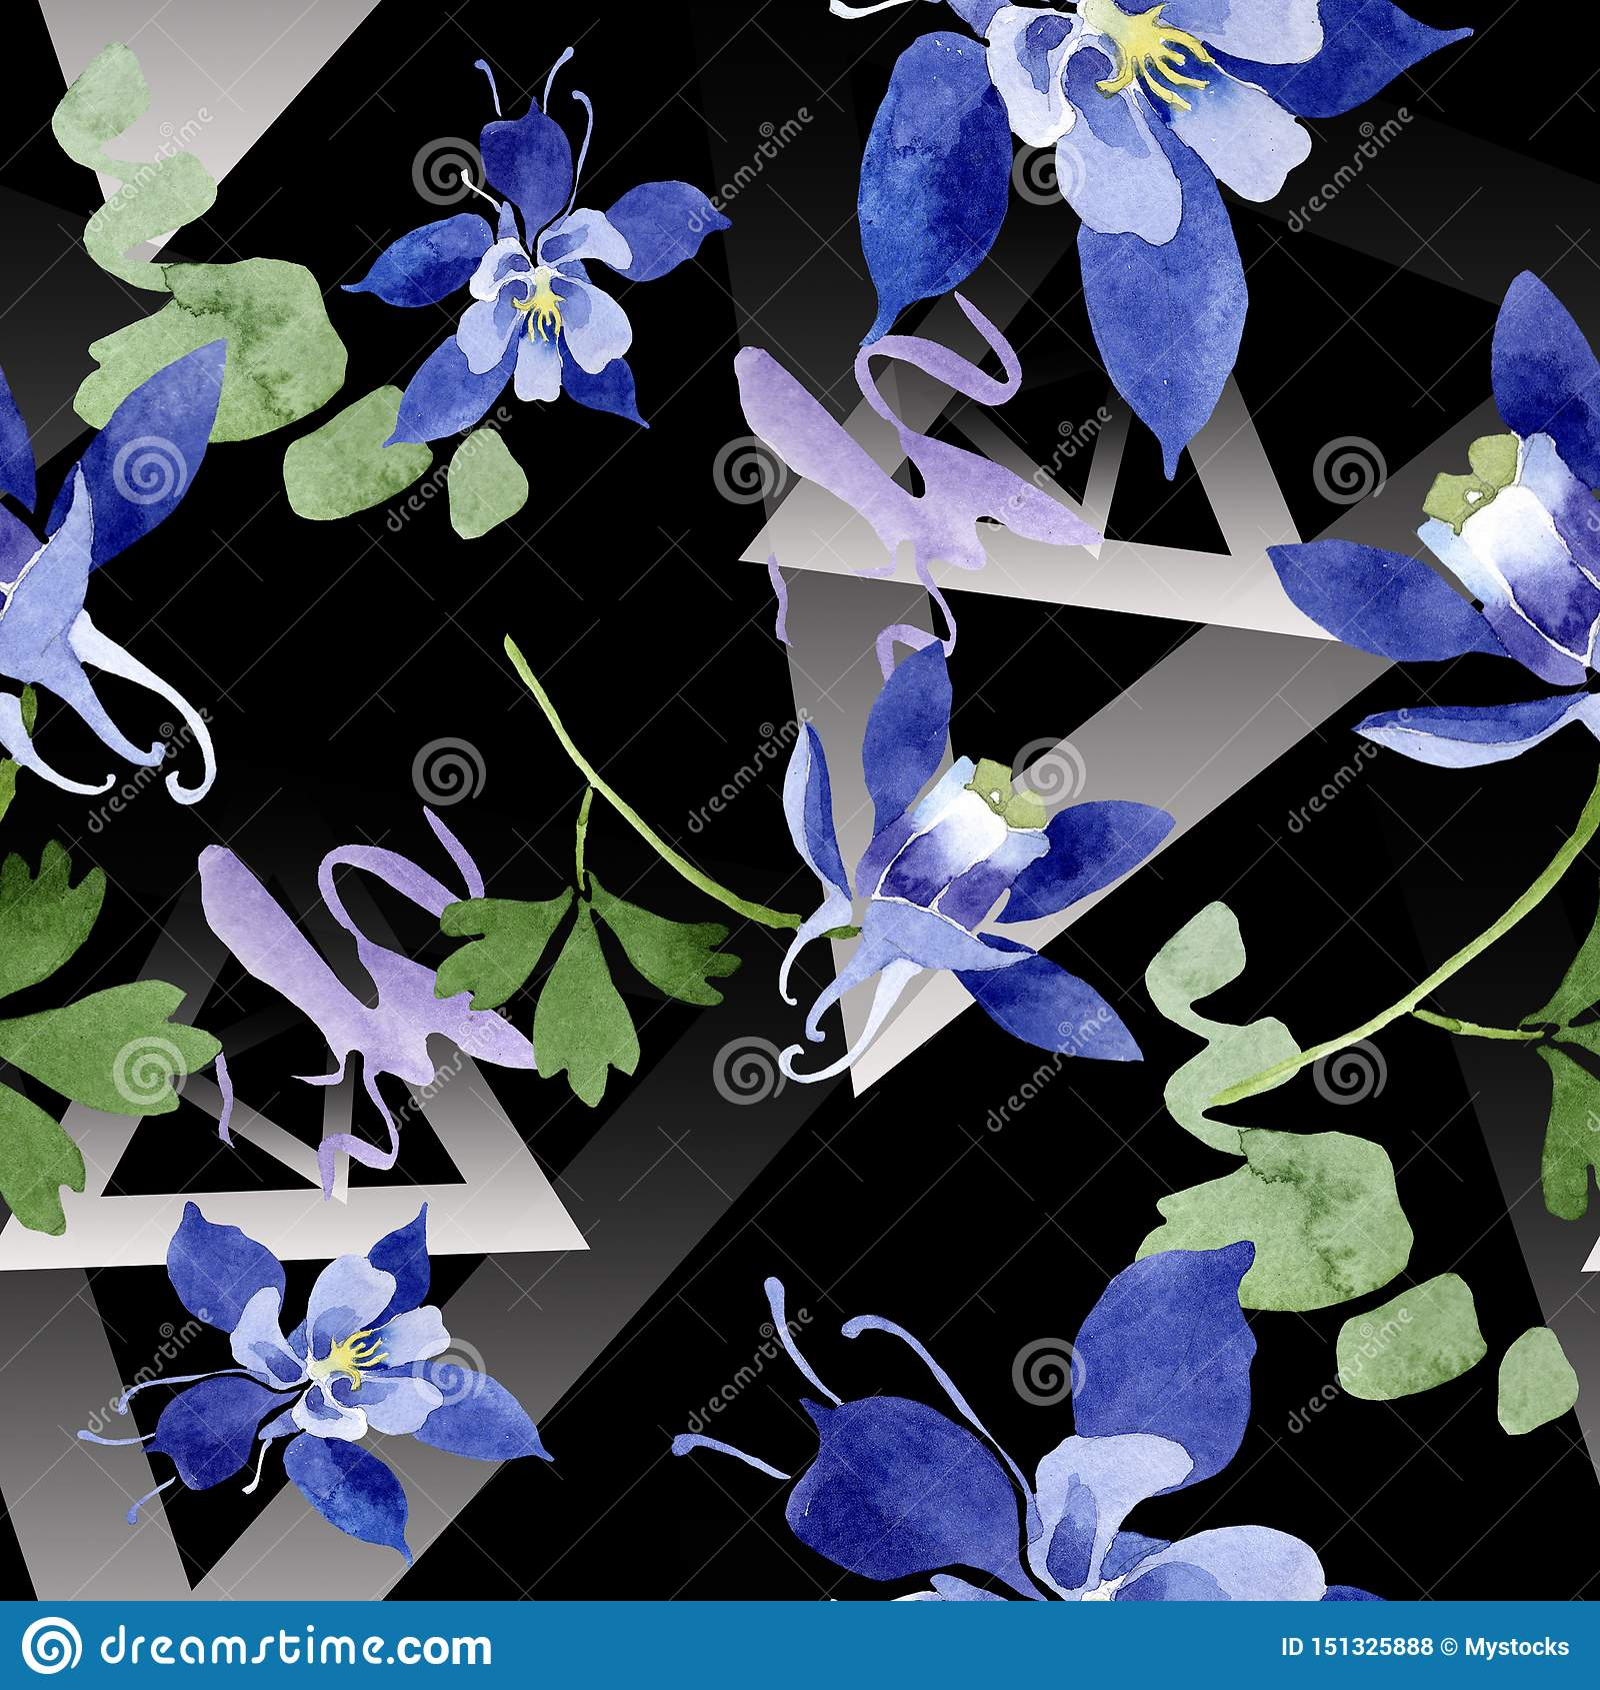 Blue aquilegia floral botanical flowers. Watercolor background illustration set. Seamless background pattern.